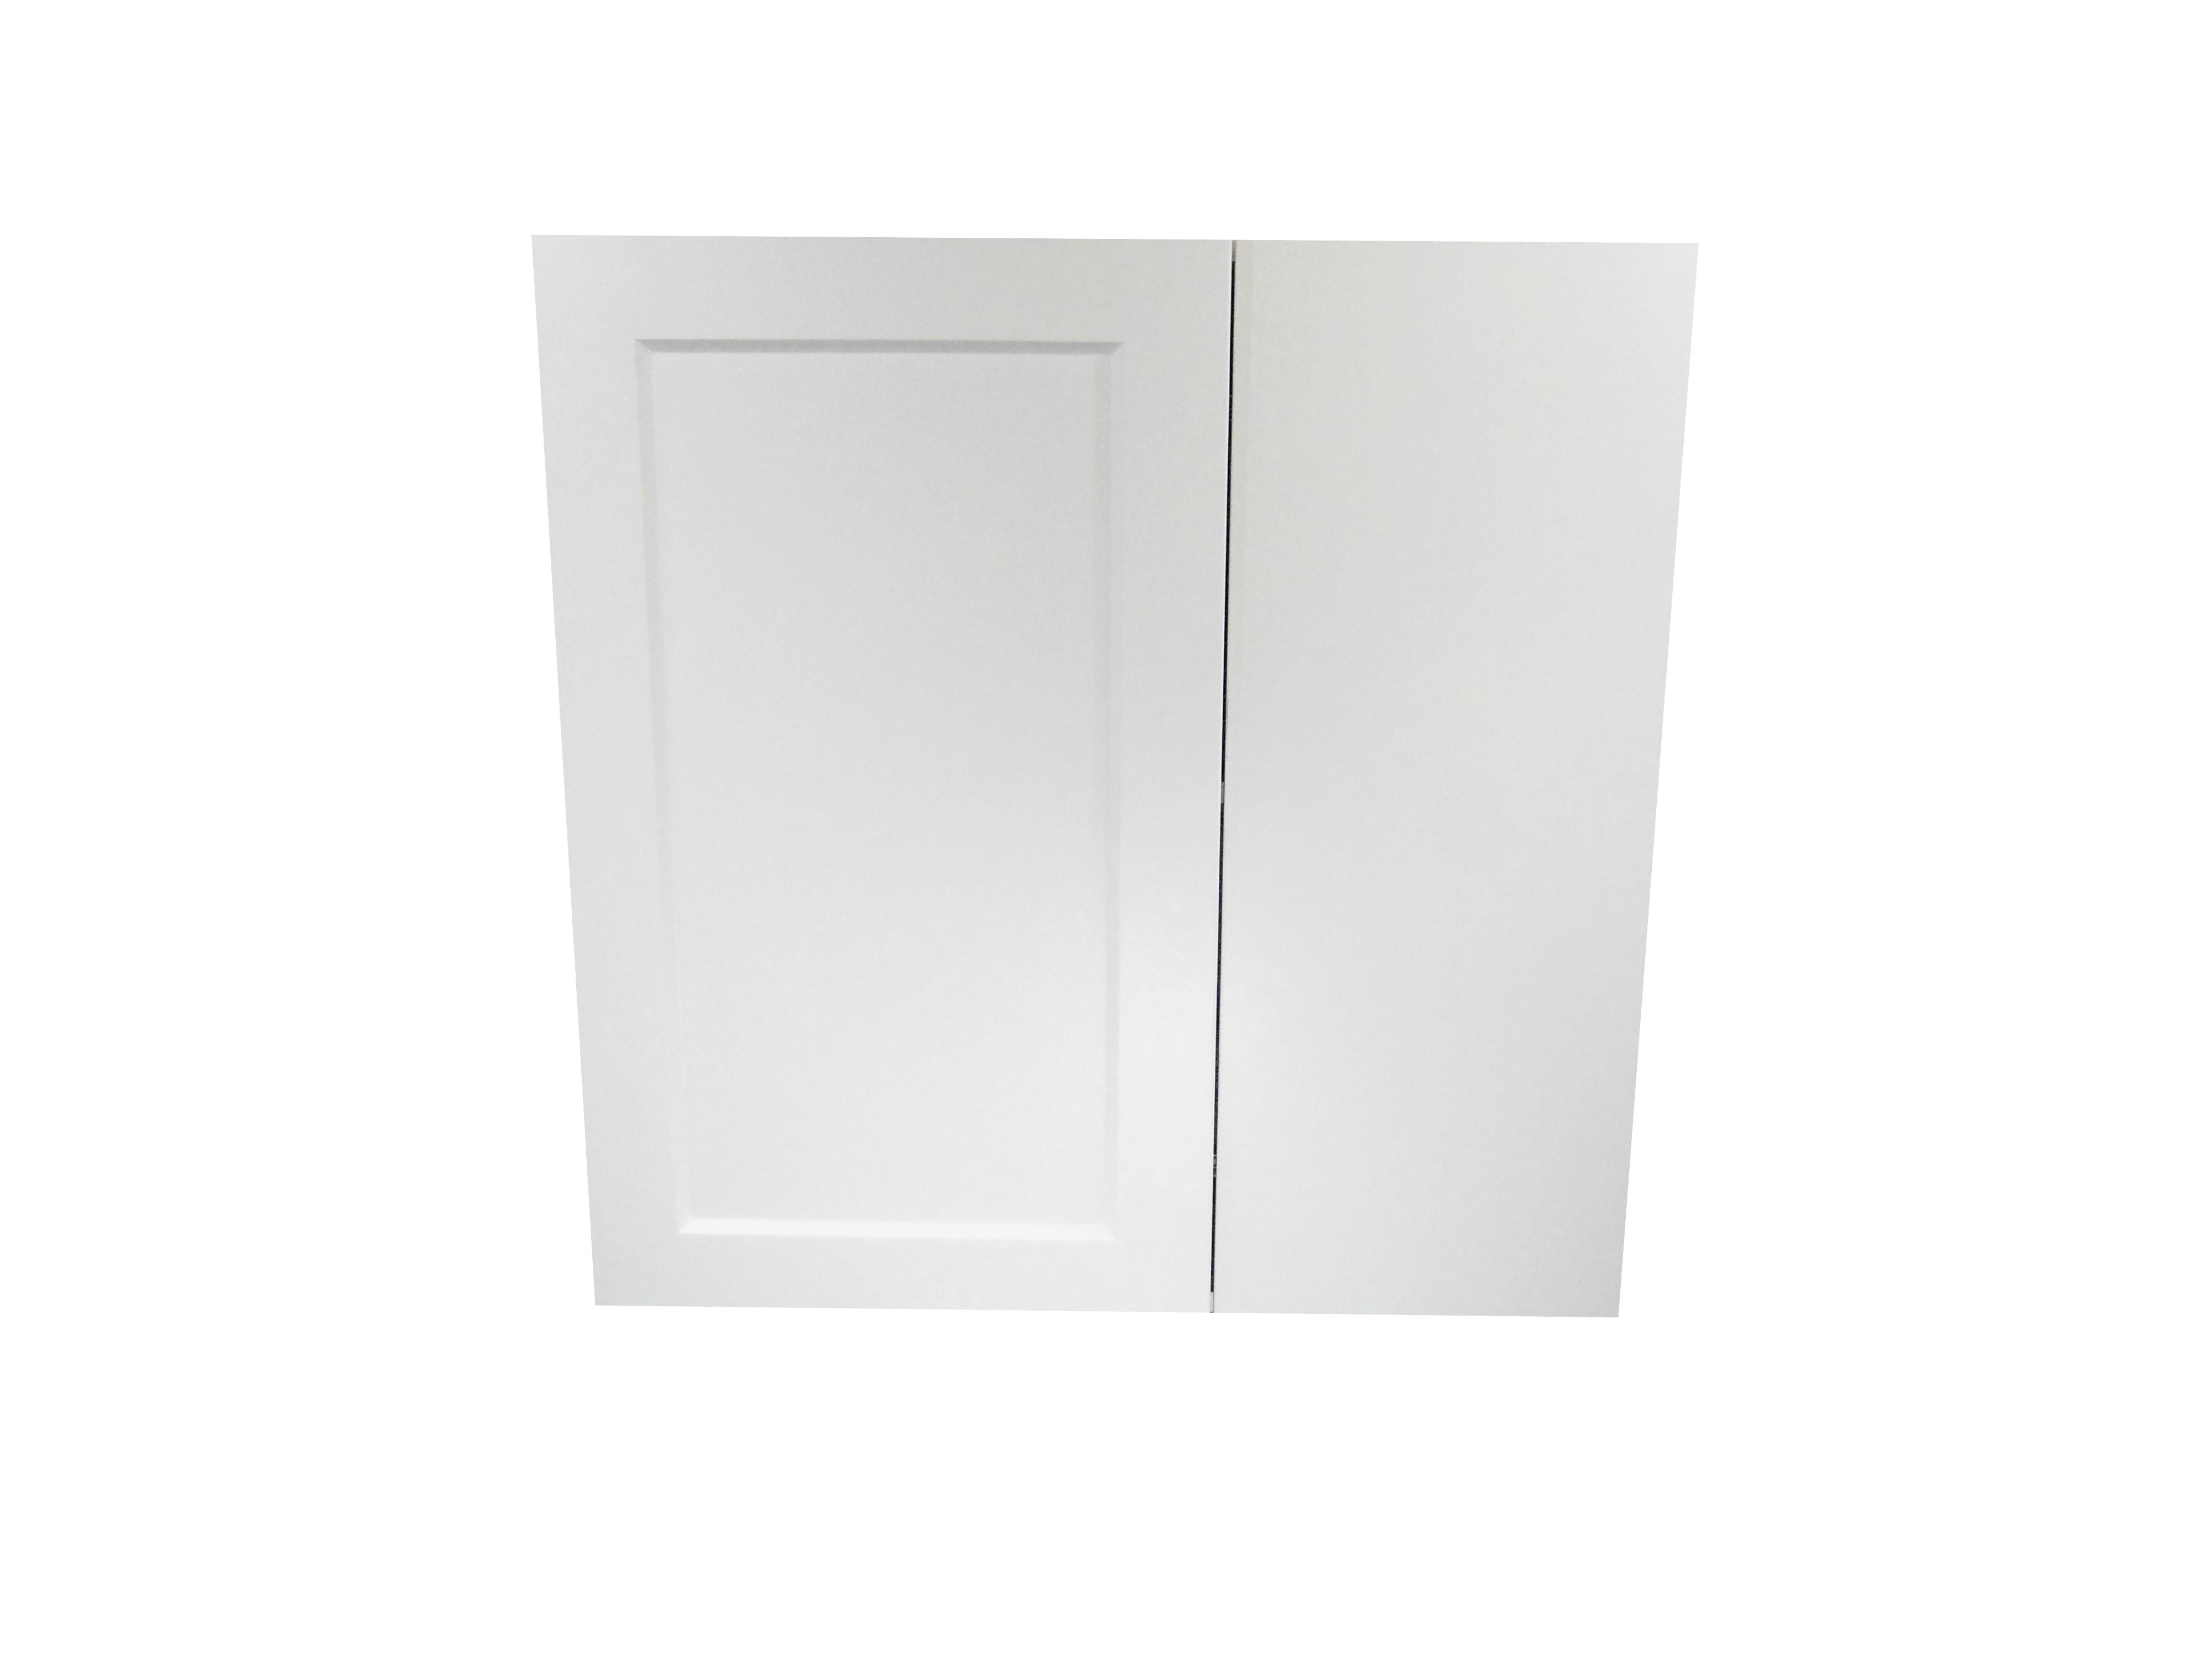 Blind Wall Cabinet / Wistler White / Flat Panel White / 30x30x30 Whistler White 0